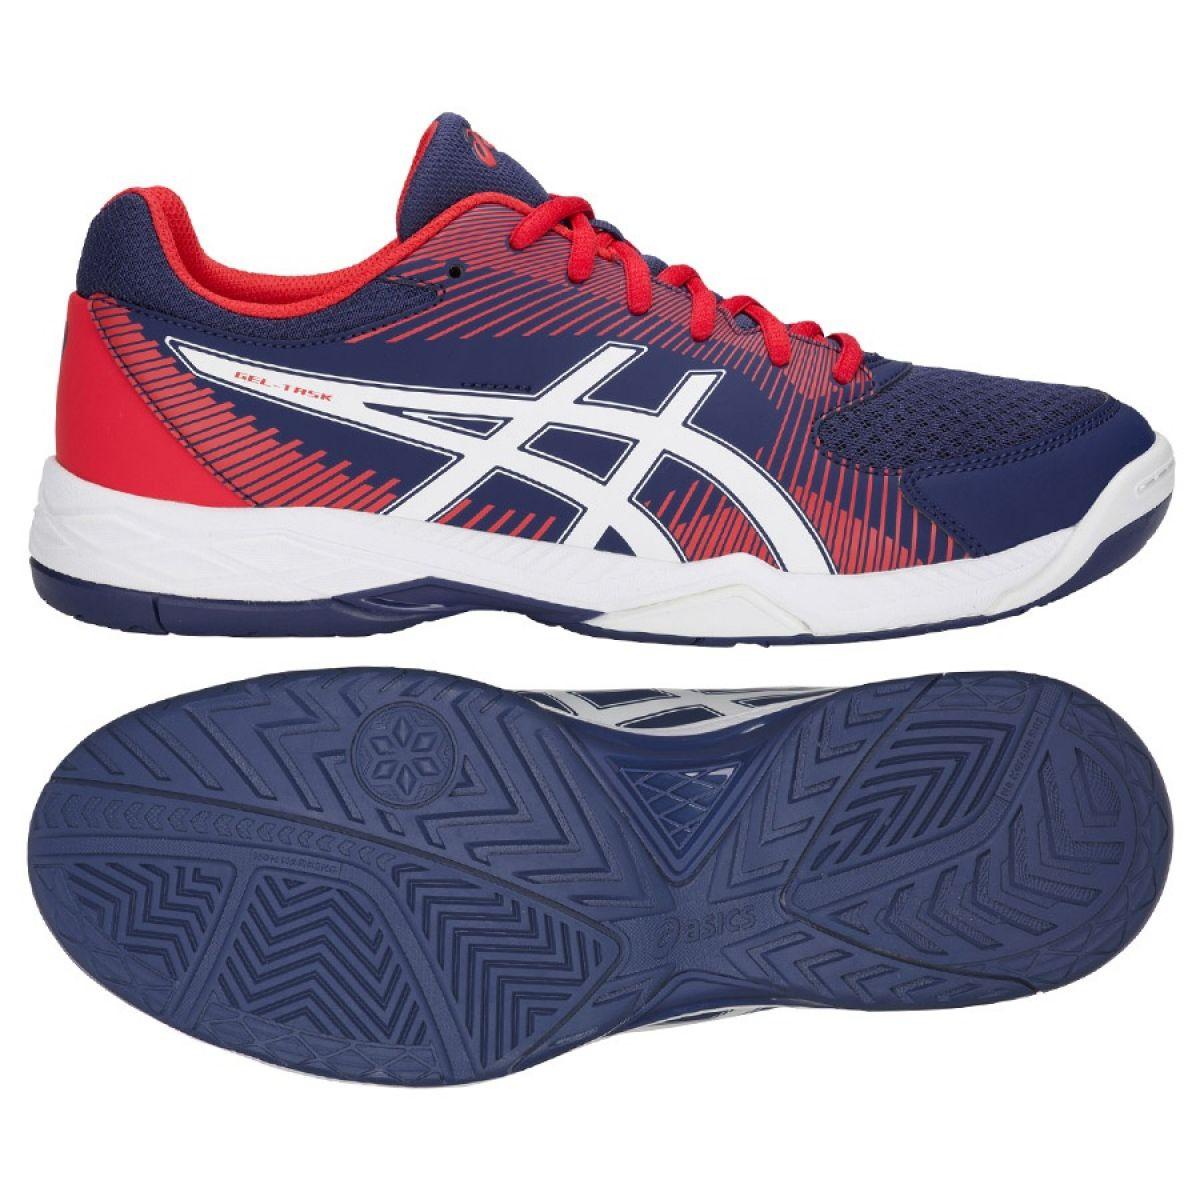 Zapatillas de voleibol Asics Gel Task M B704Y 400